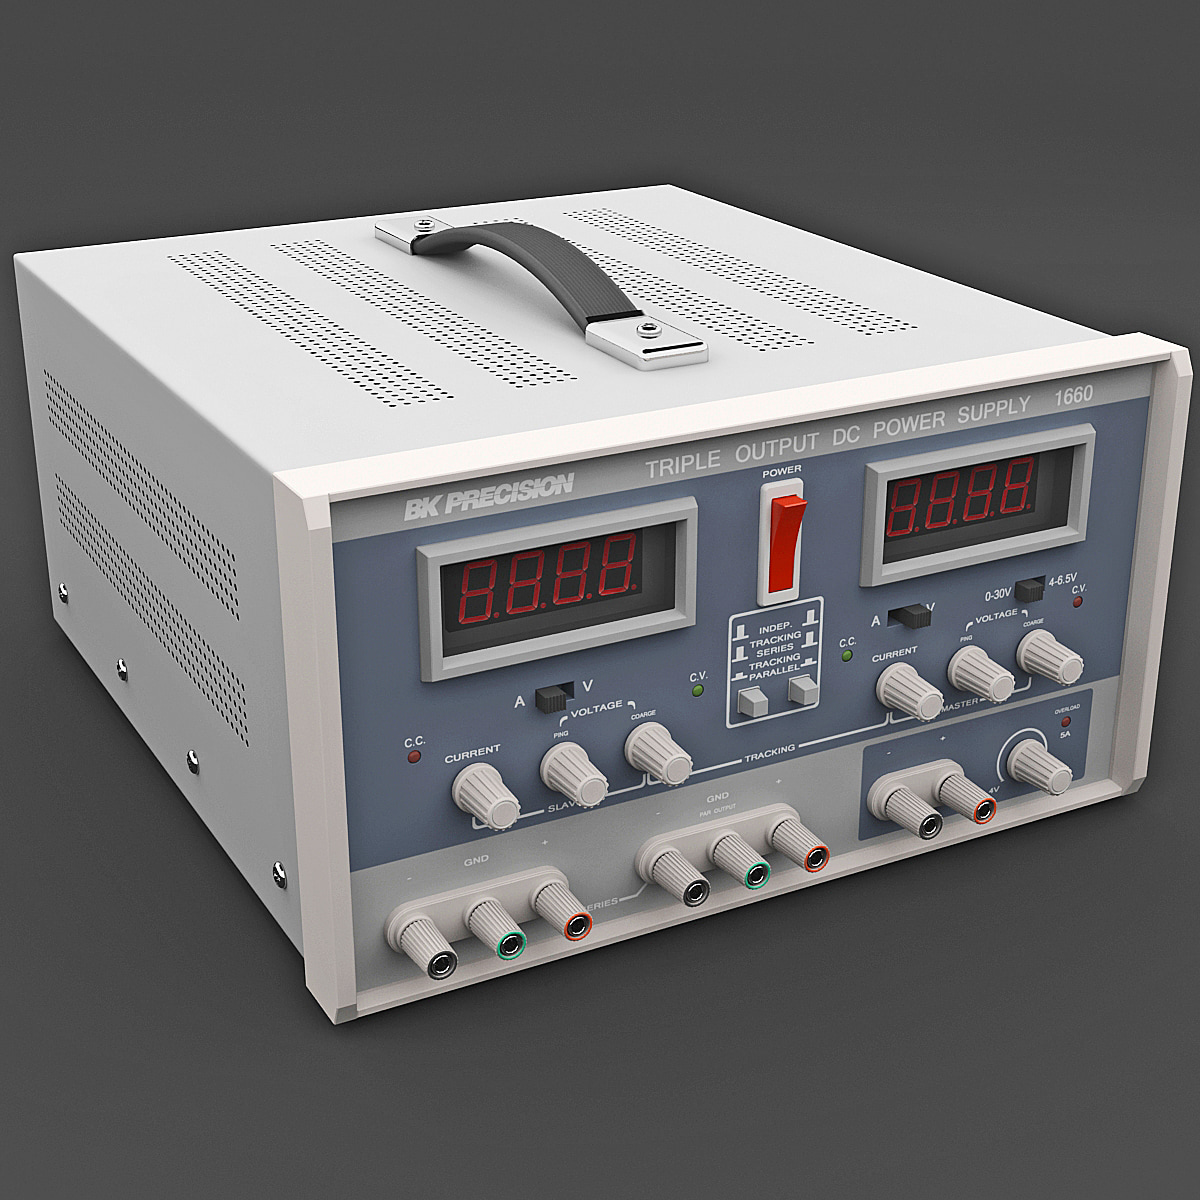 3d model bk precision 1660 power